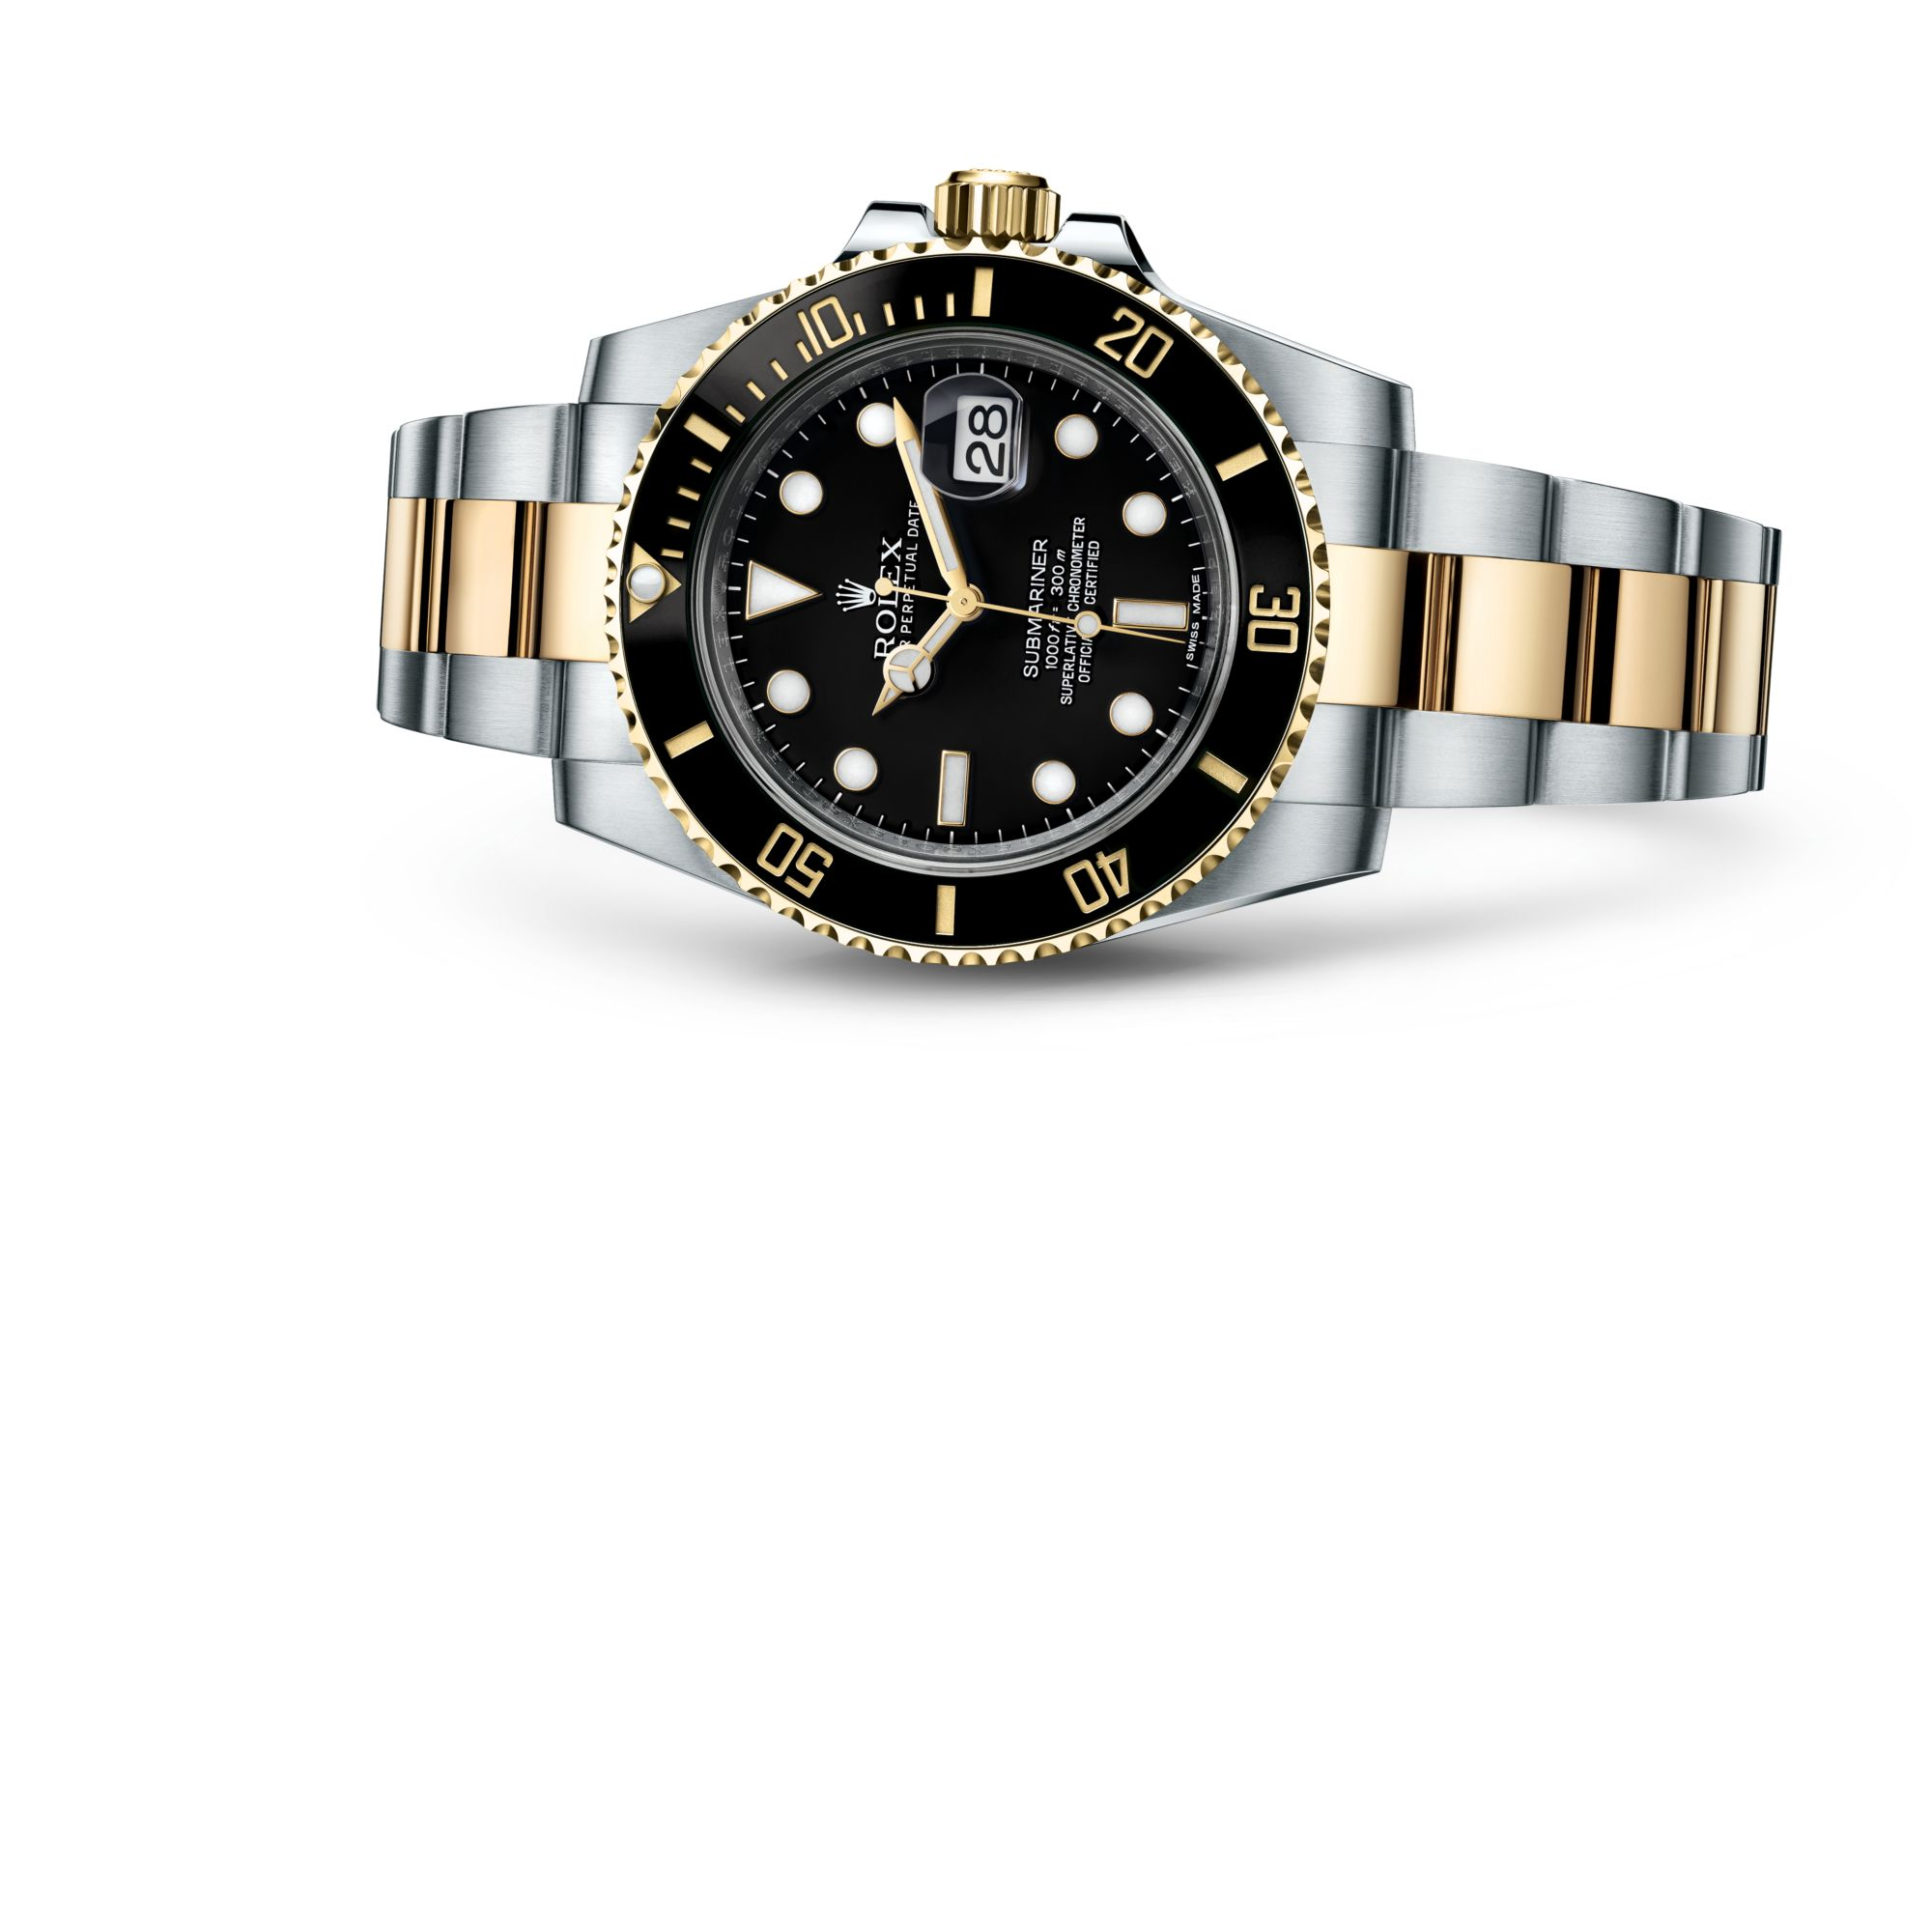 Rolex صبمارينر ديت M116613LN-0001